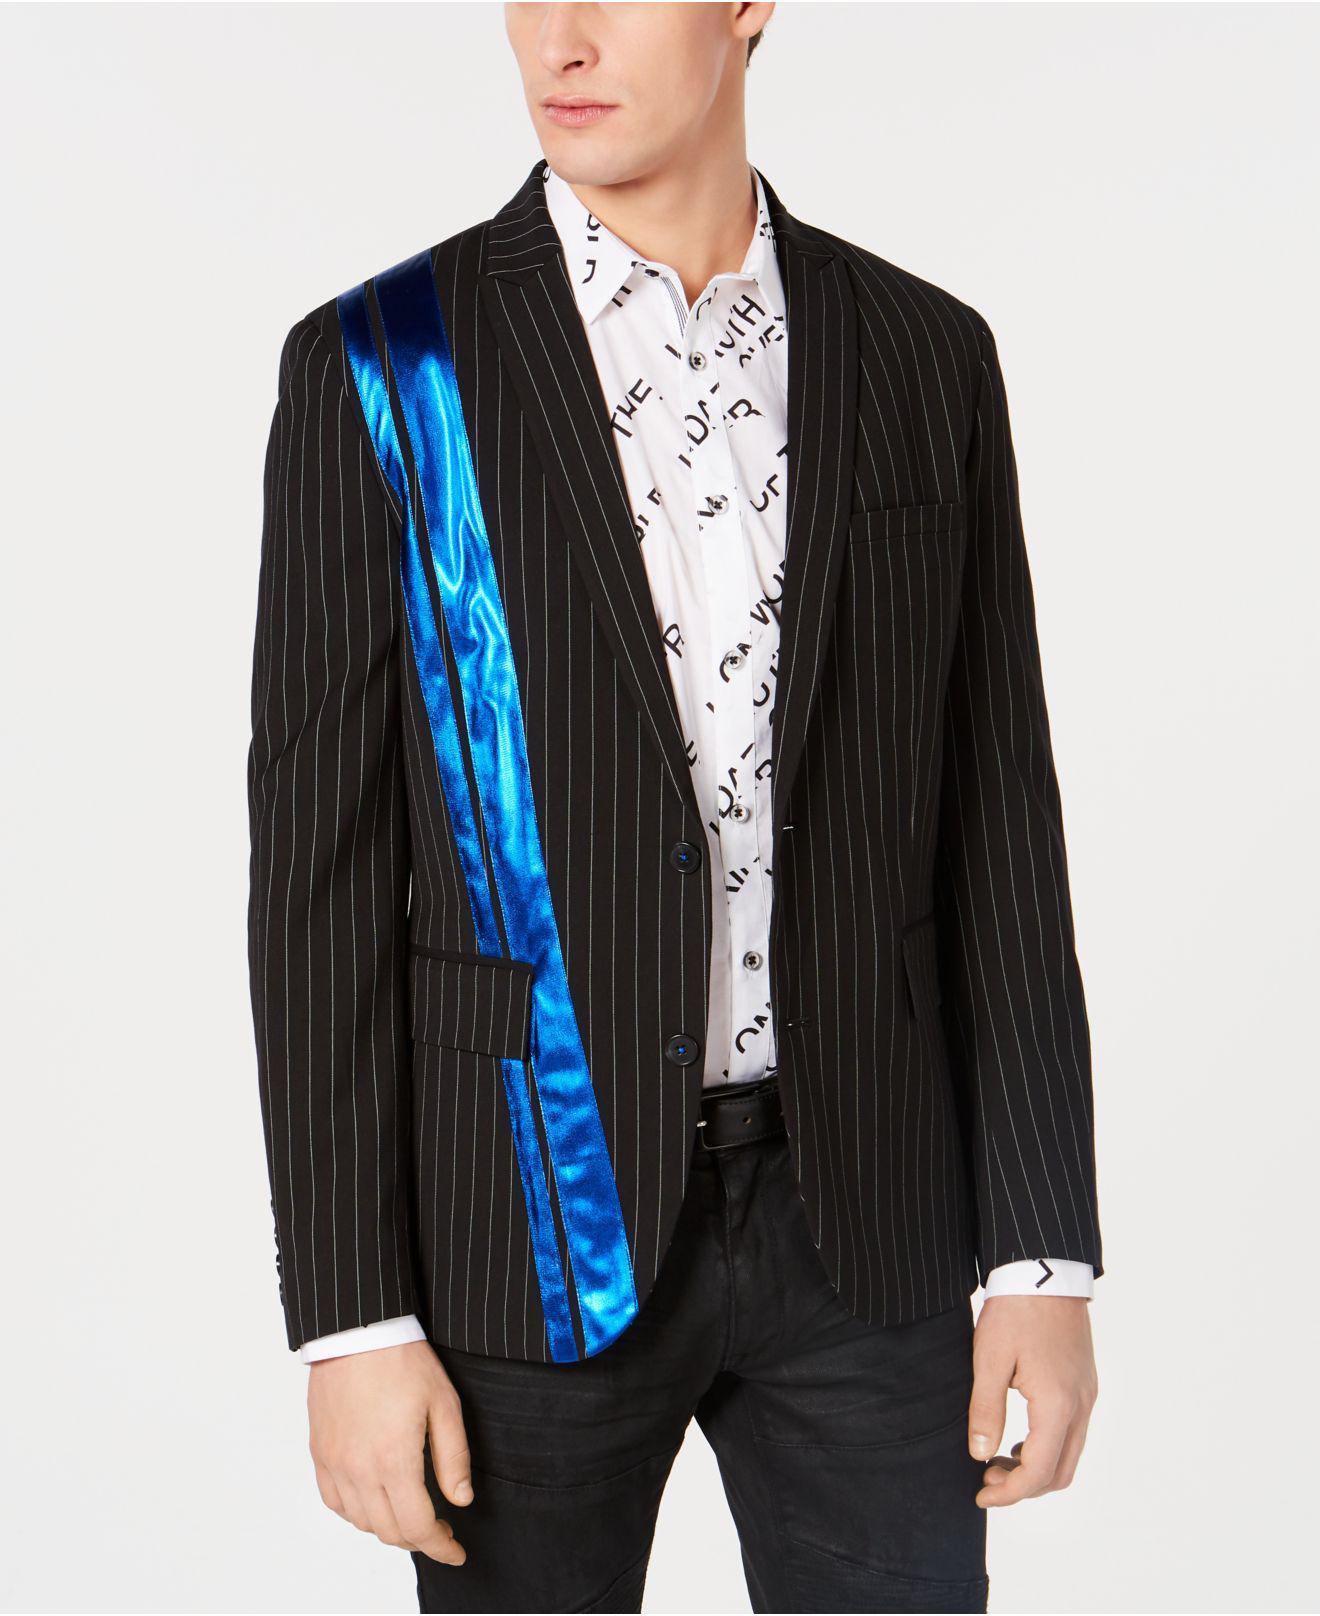 47a438a46a8a INC International Concepts. Men s Black Slim-fit Pinstriped Pieced Blazer  ...